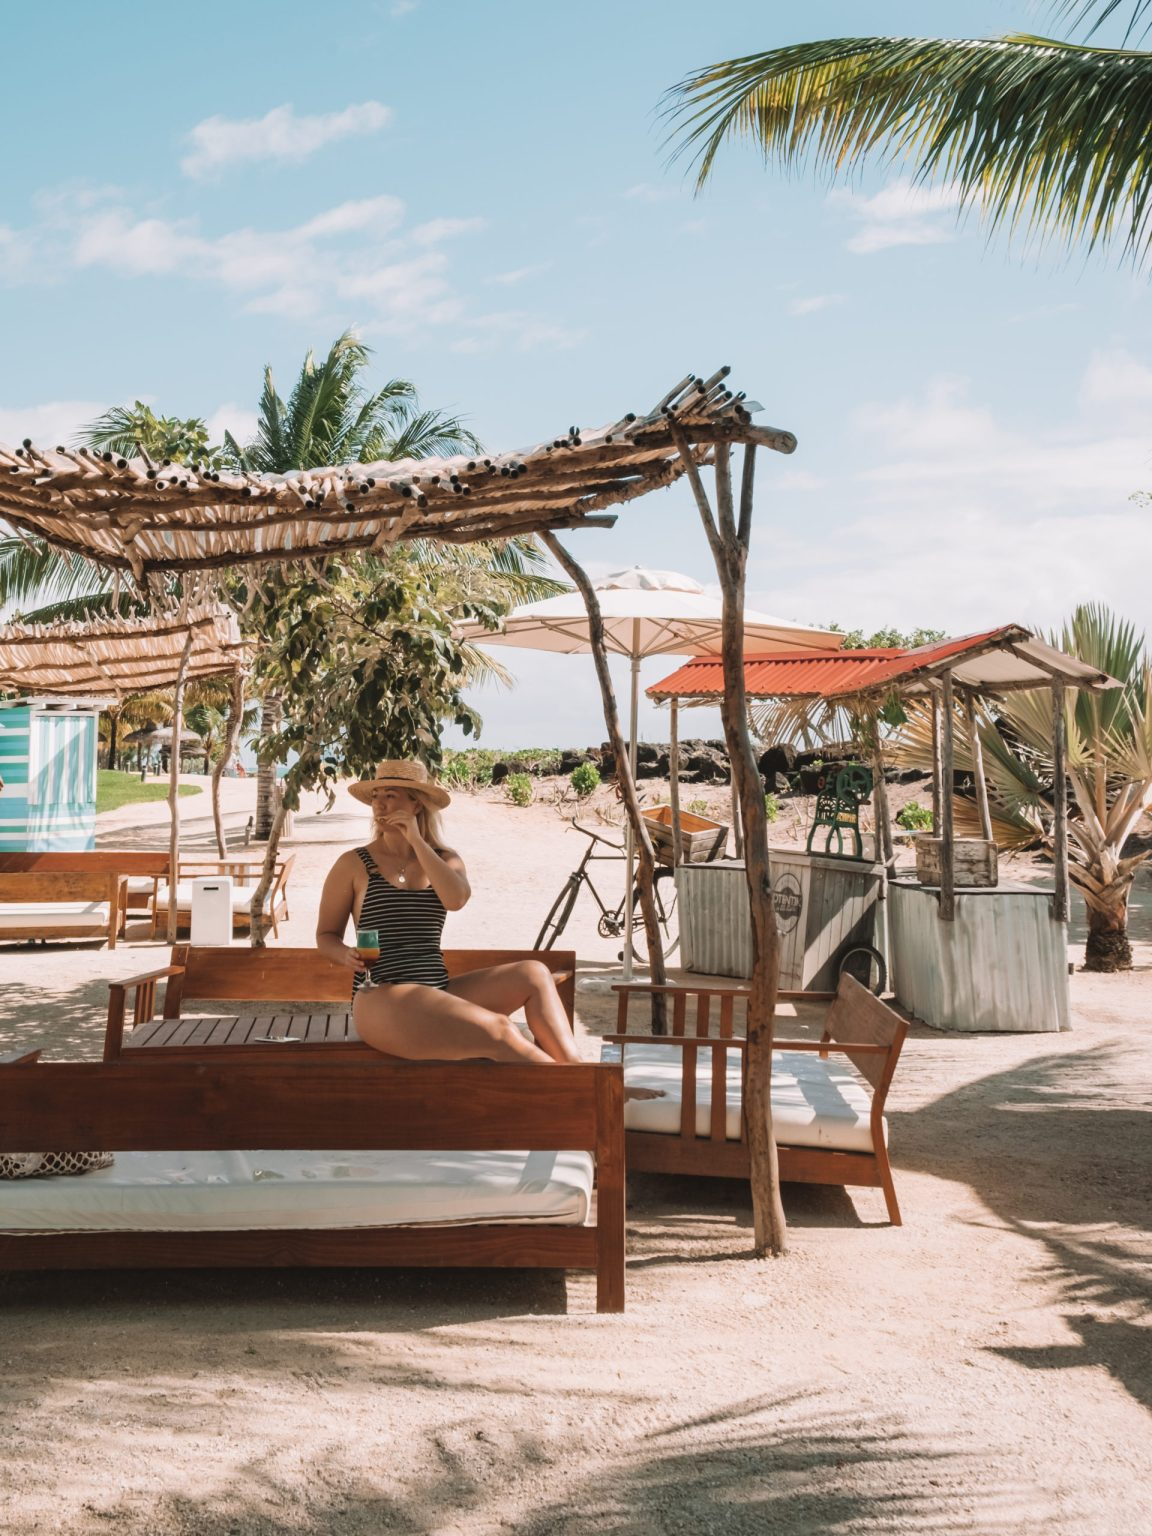 zilwa attitude hotel mauritius beach